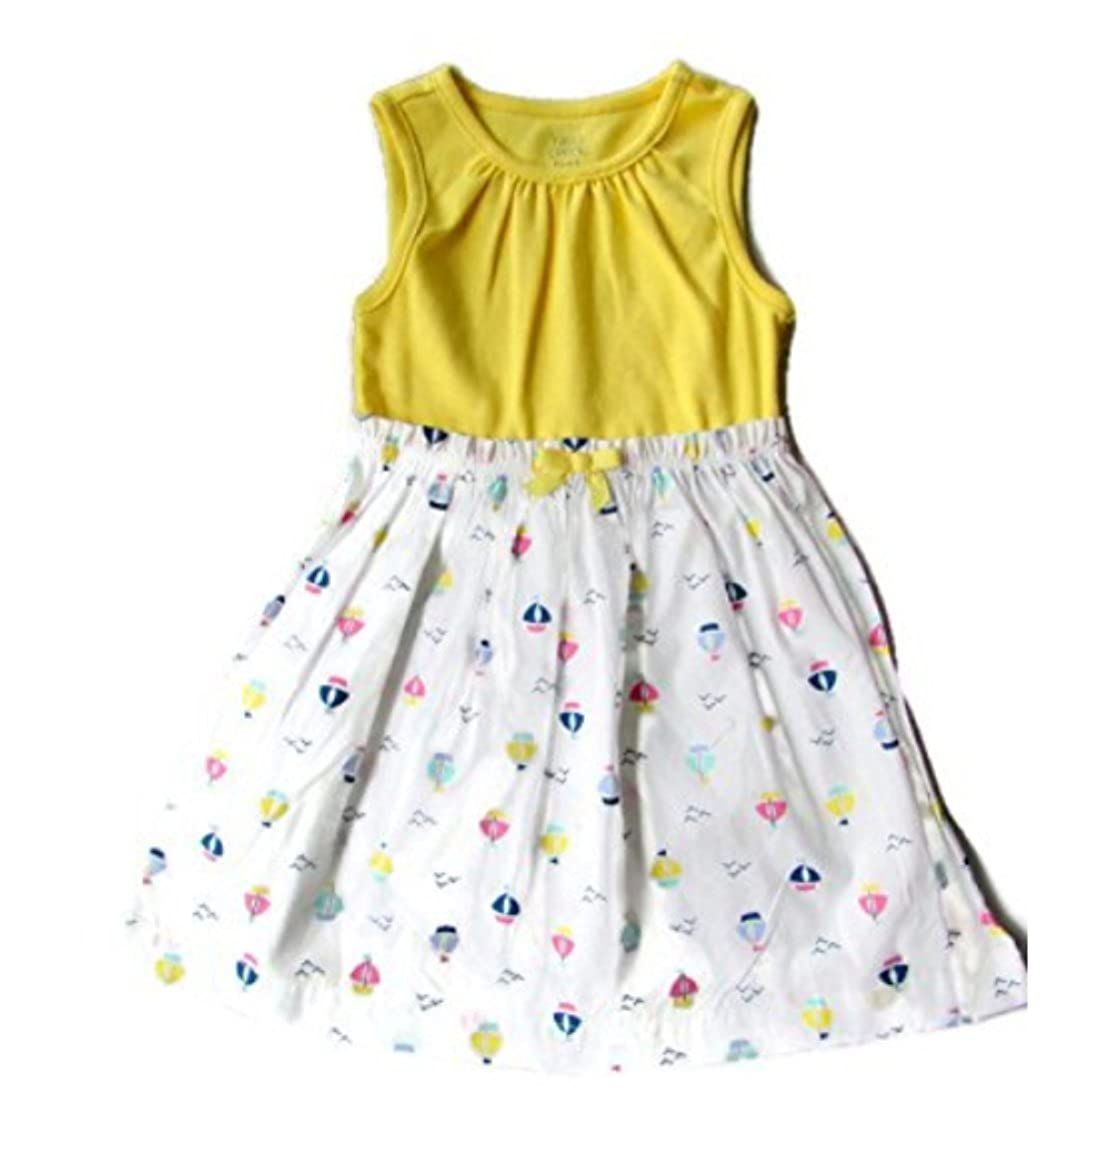 8cef9e0d8d83b Baby Girlsヨットノースリーブコットン100 %サンドレスドレスセット 0 - 3 Months Sailboat